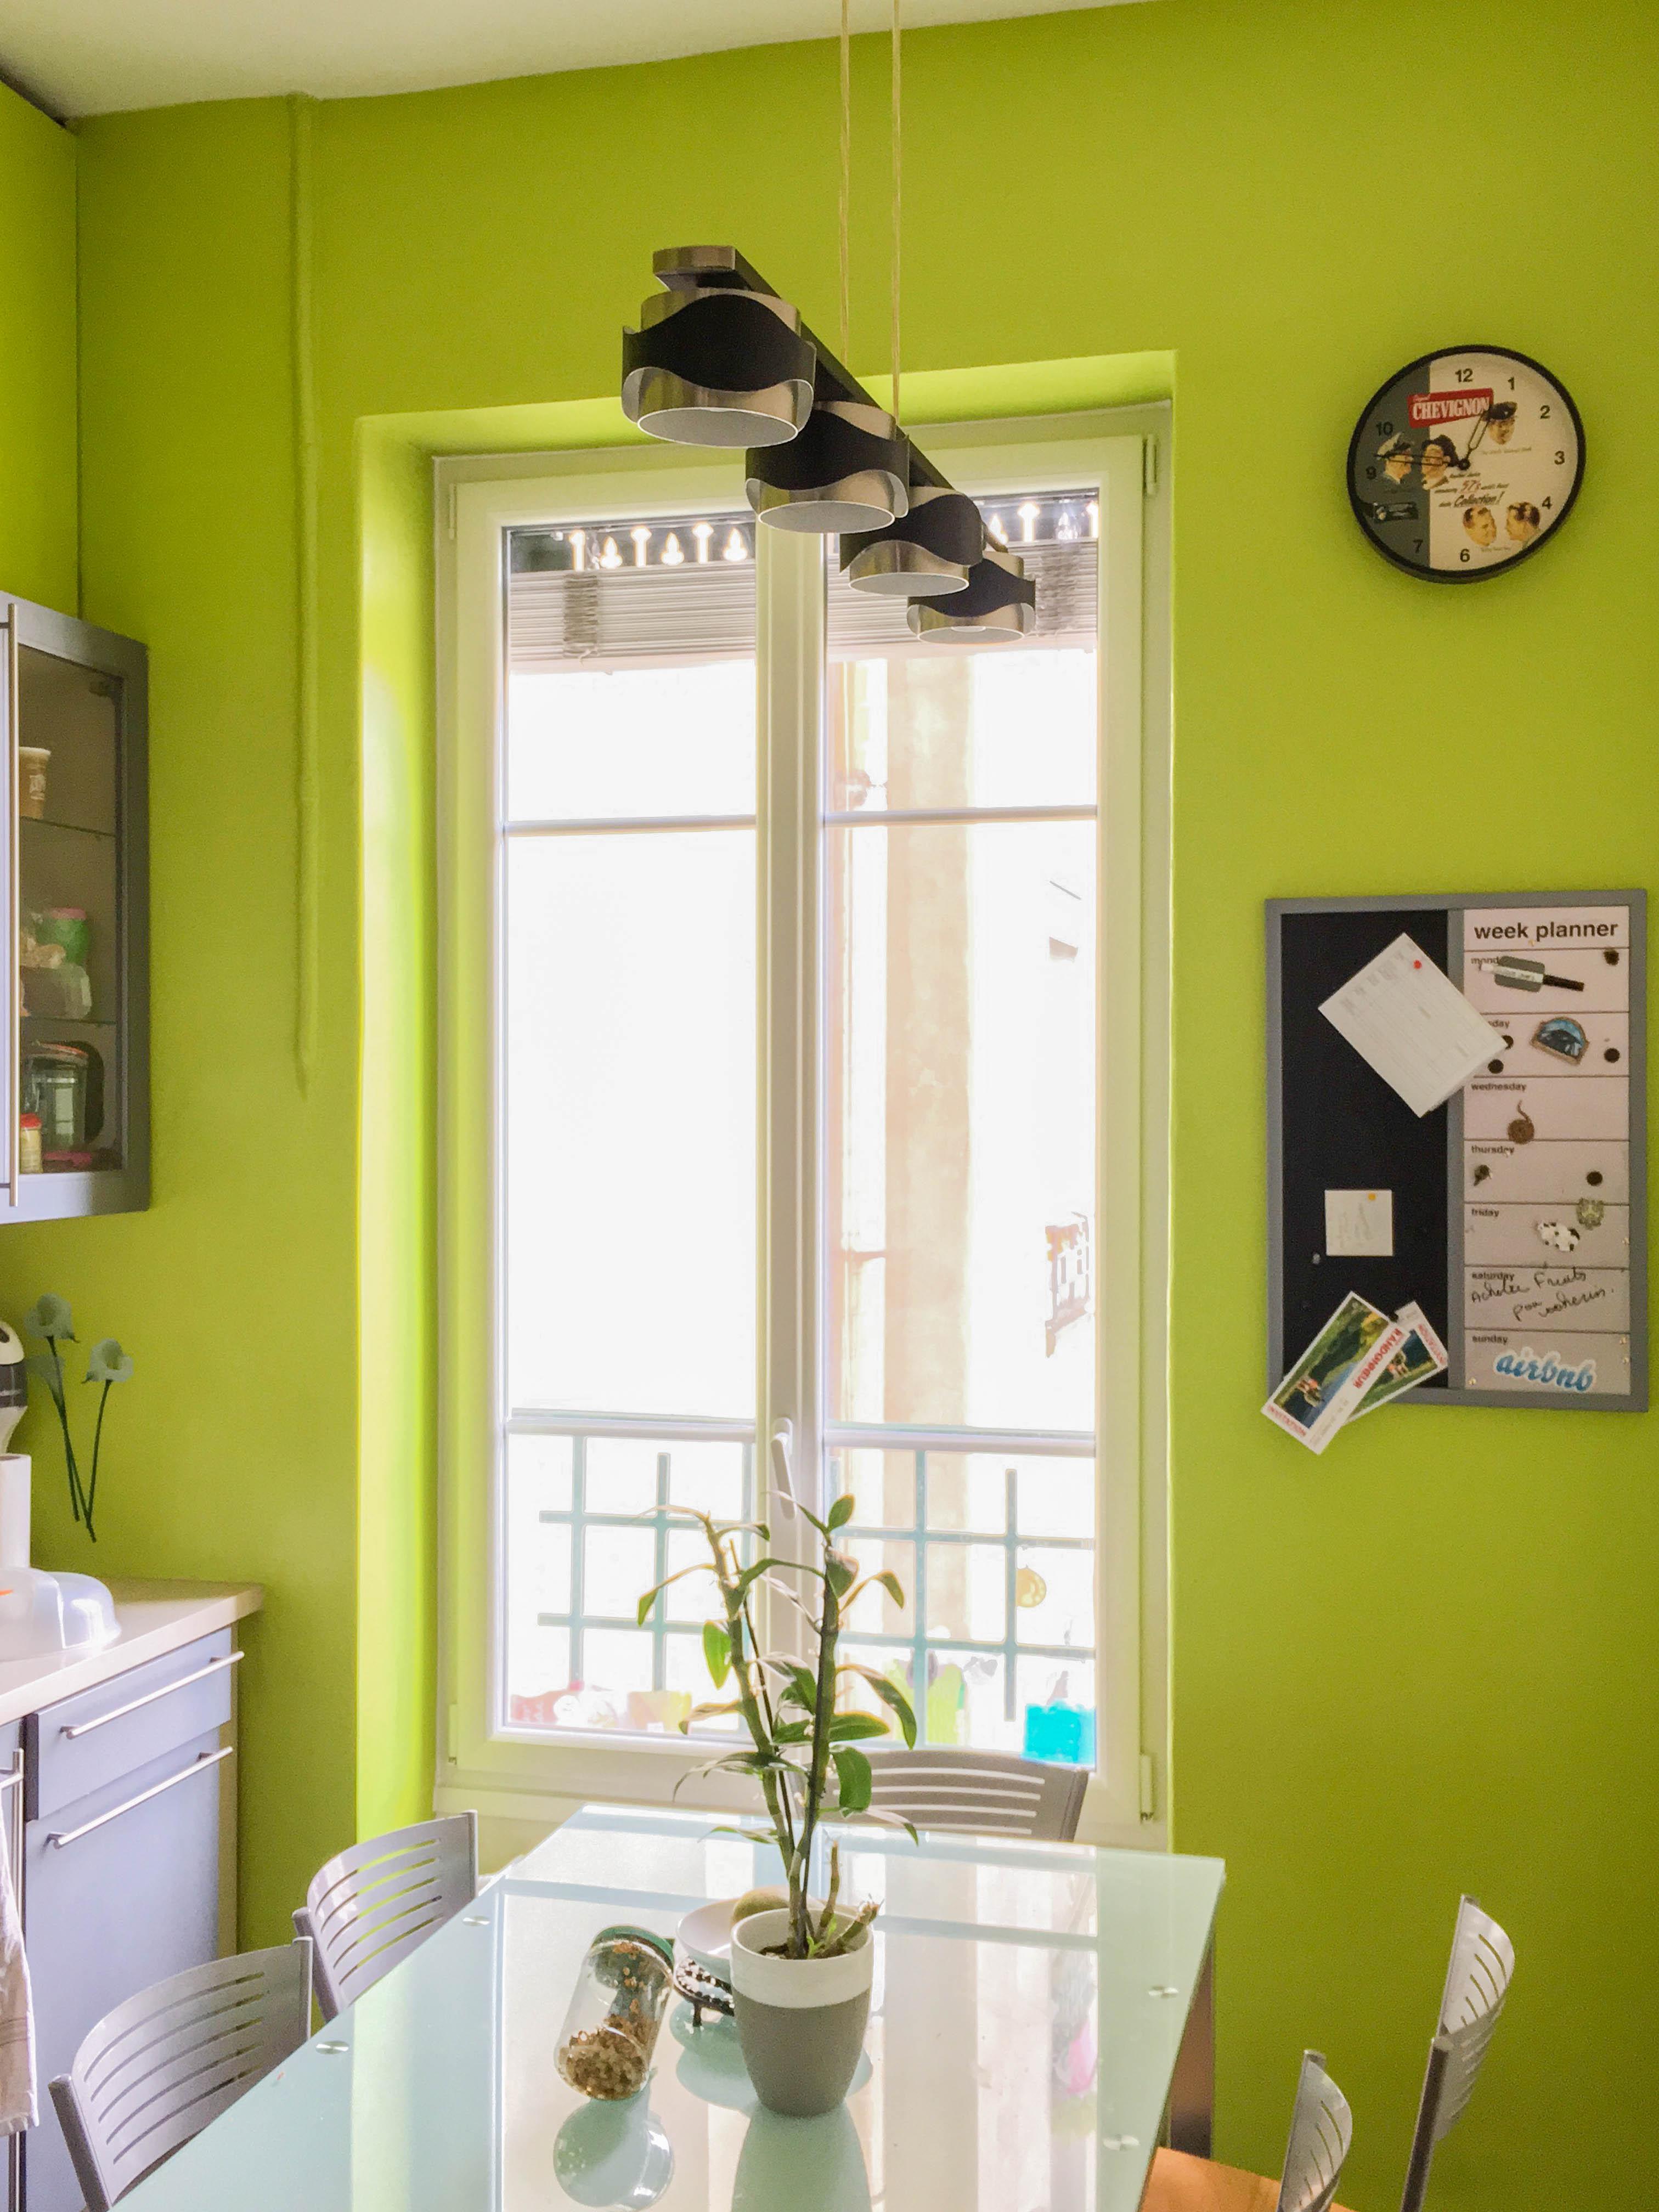 fenetres pvc idealis fermetures fenetres lyon. Black Bedroom Furniture Sets. Home Design Ideas